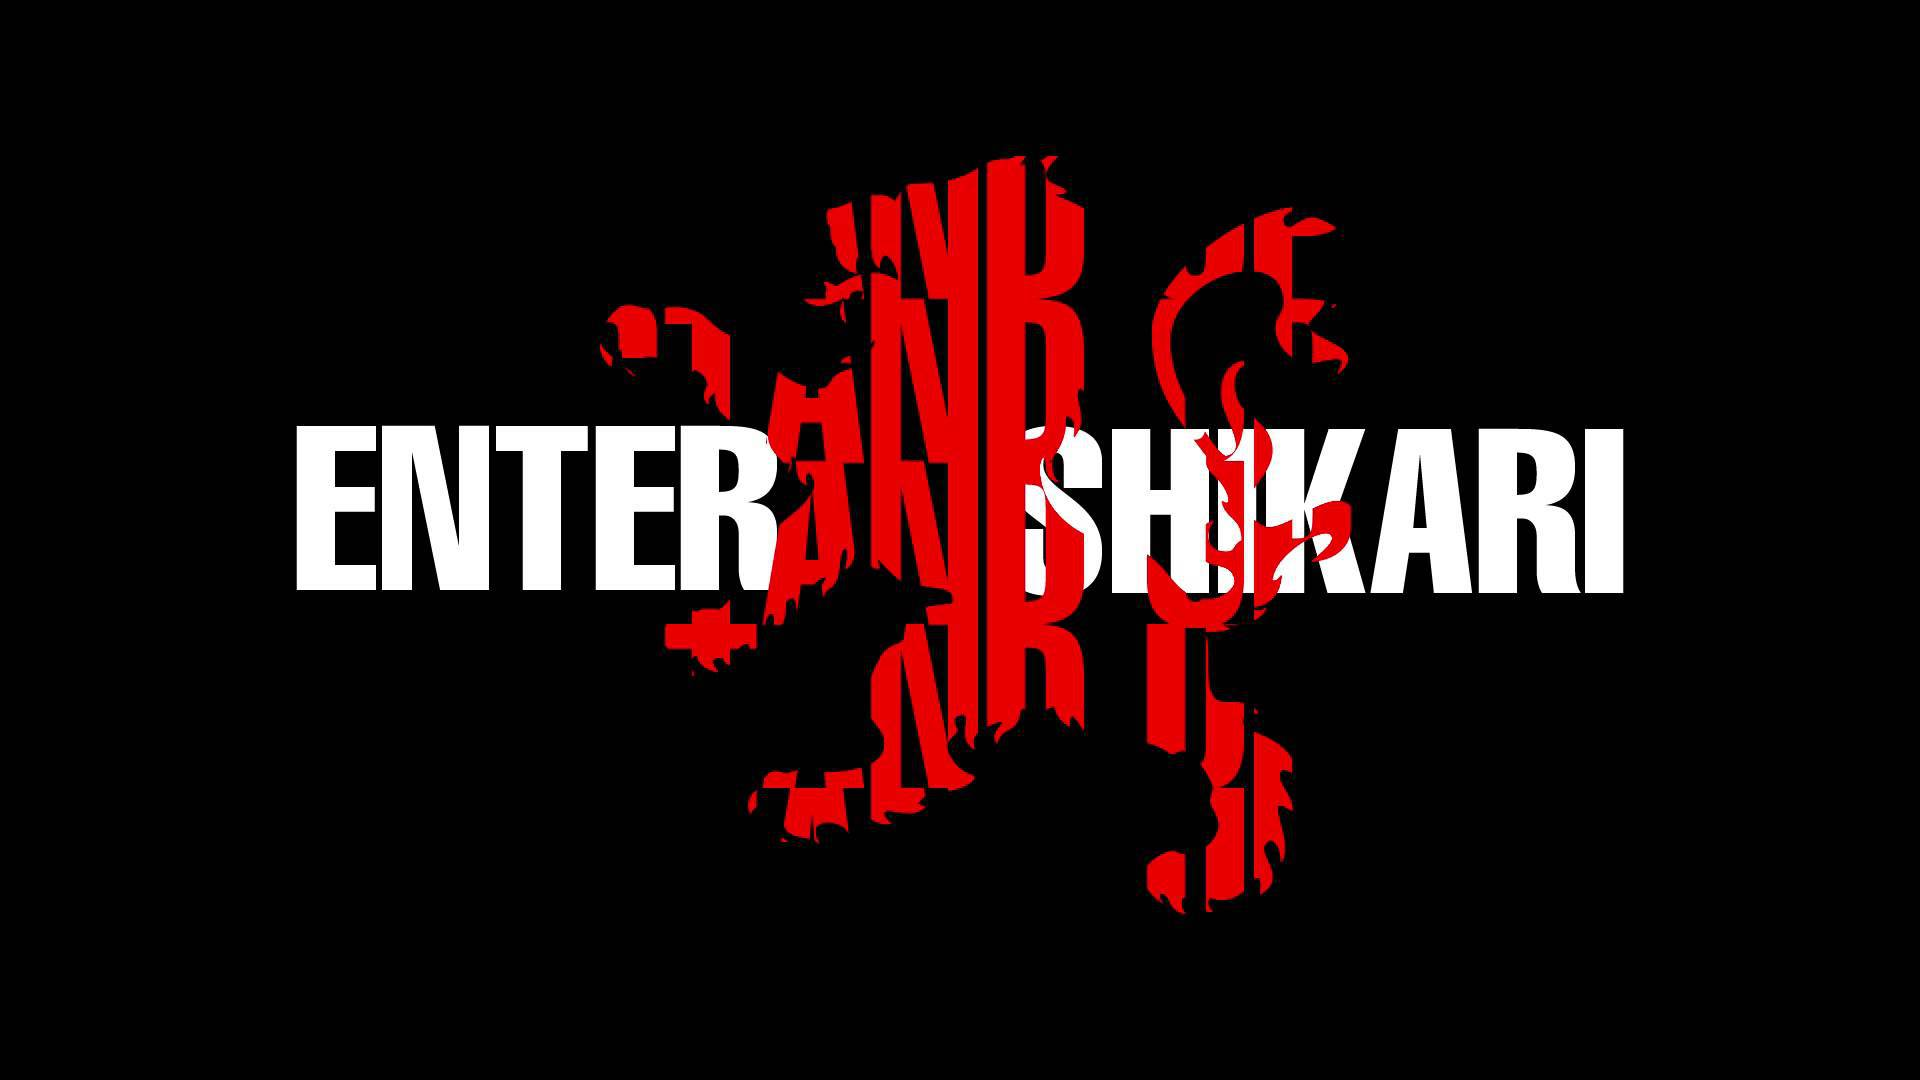 Enter Shikari Hd Wallpaper